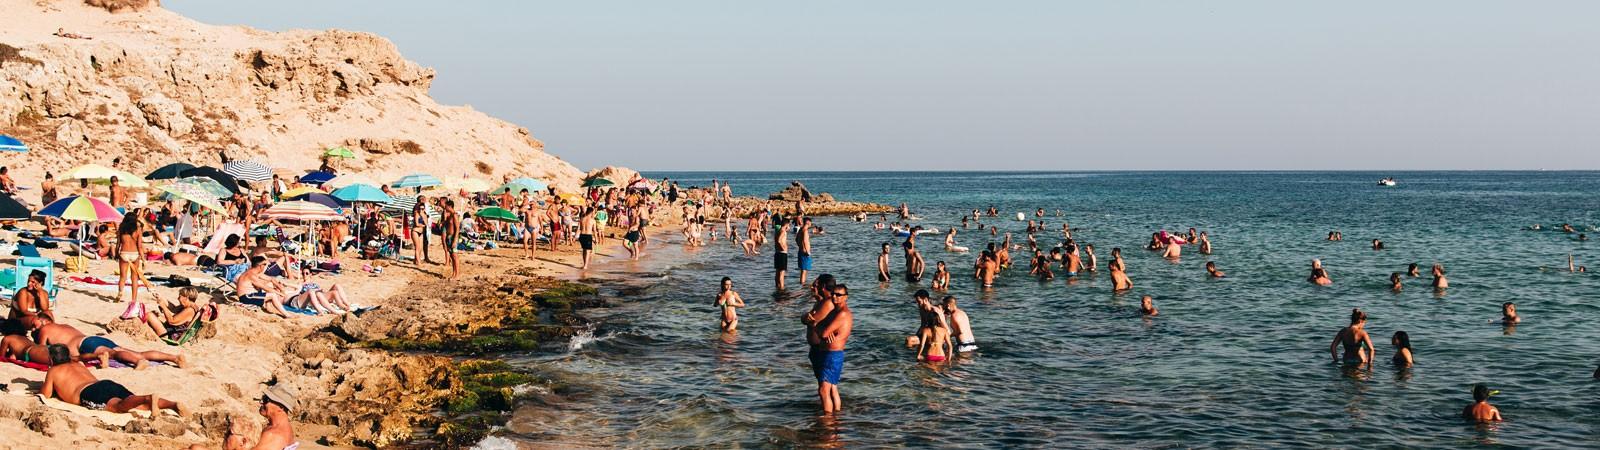 Beach party a lido Pazze - Student Village